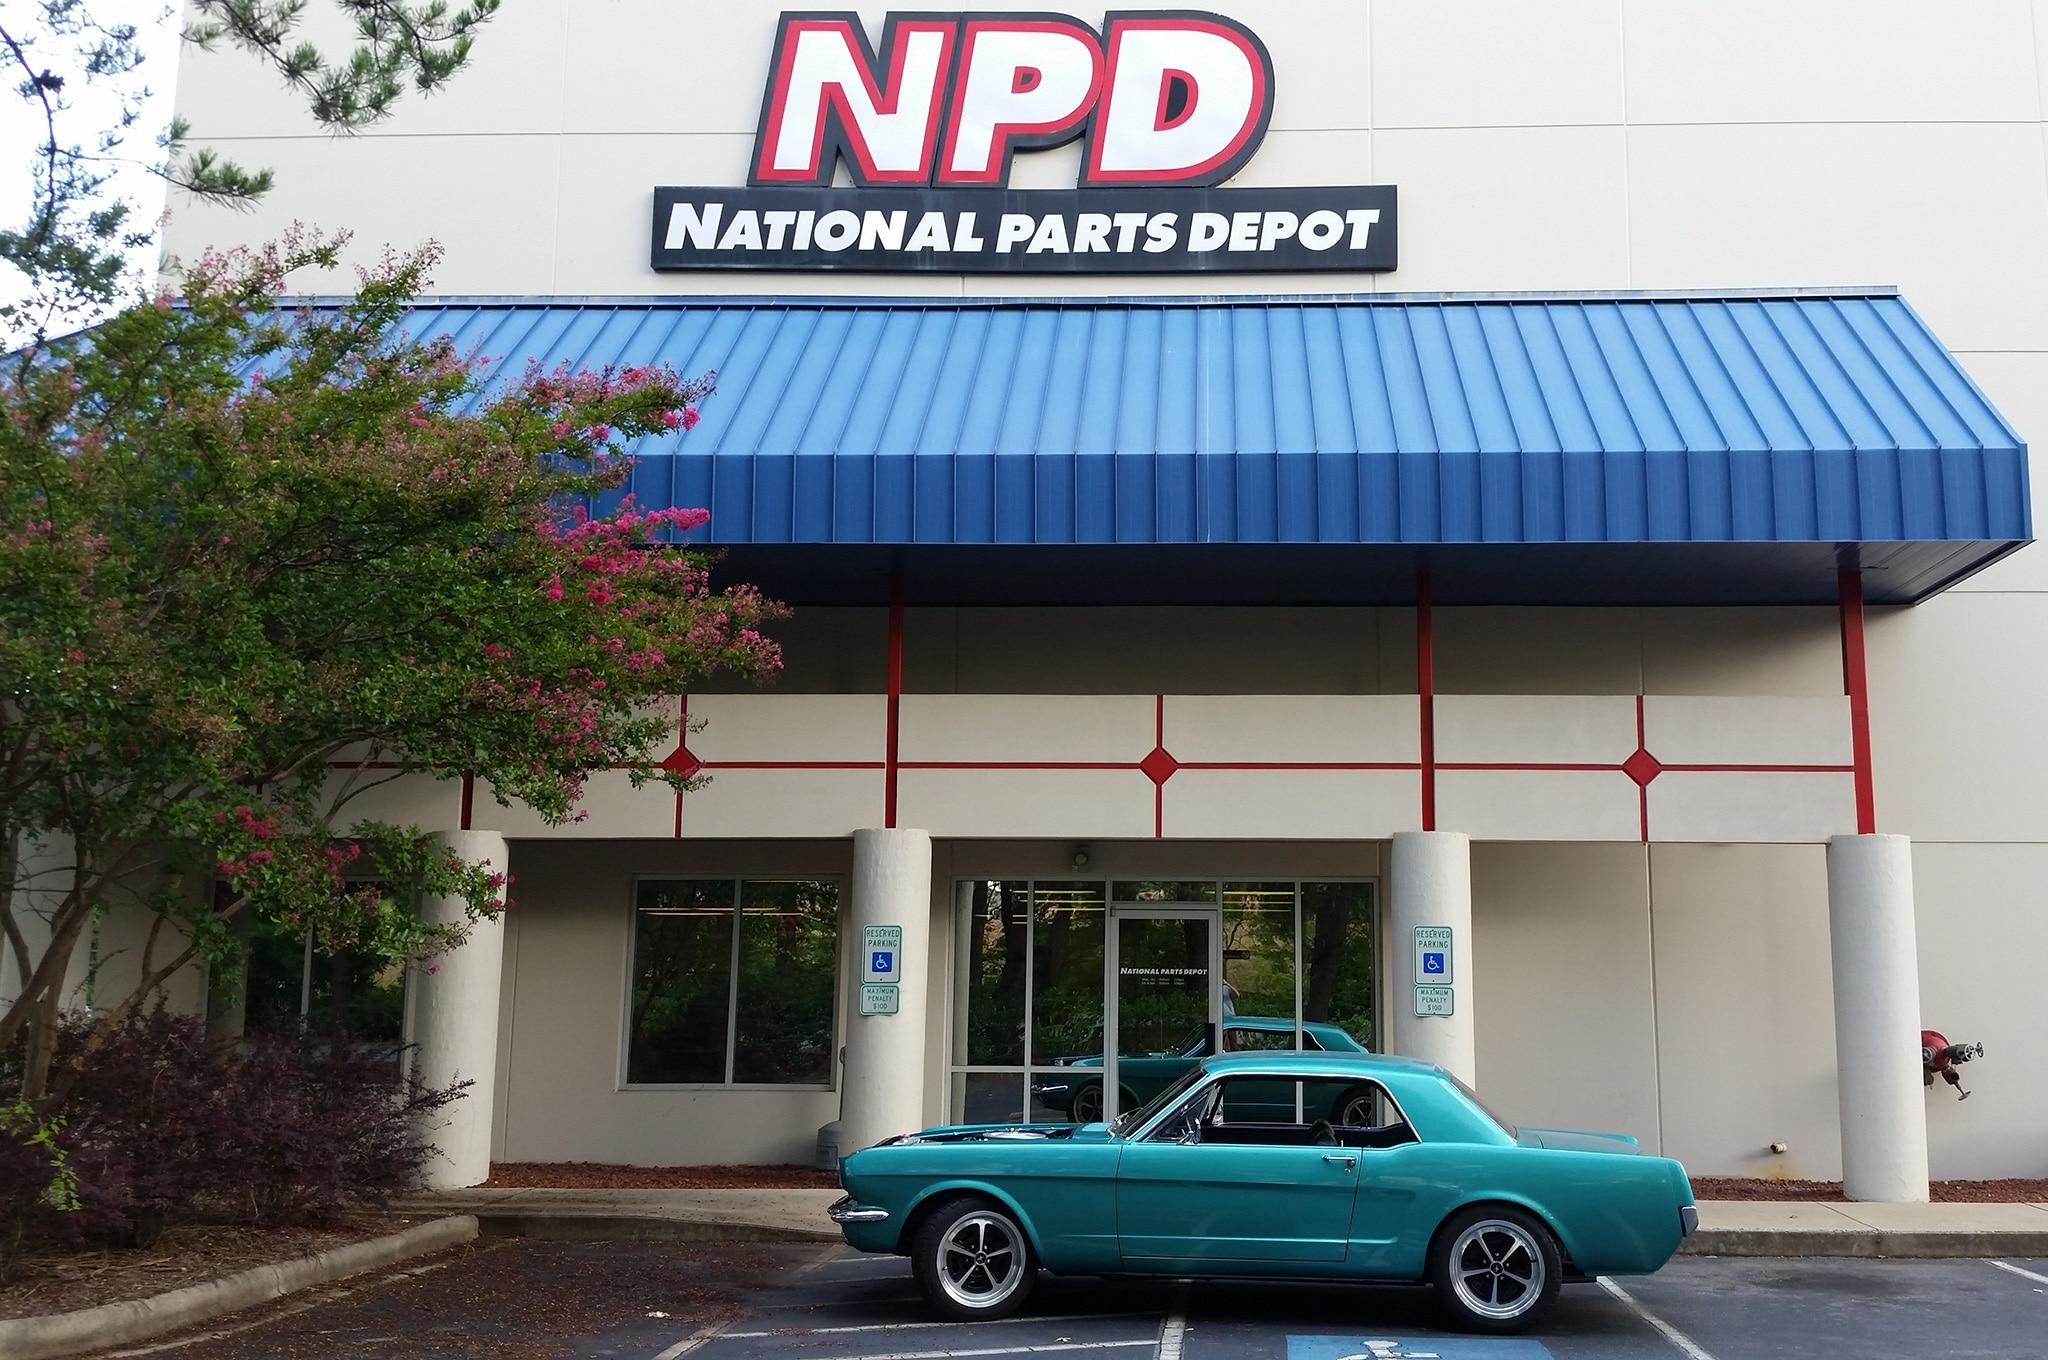 14 1965 Ford Mustang National Parts Depot